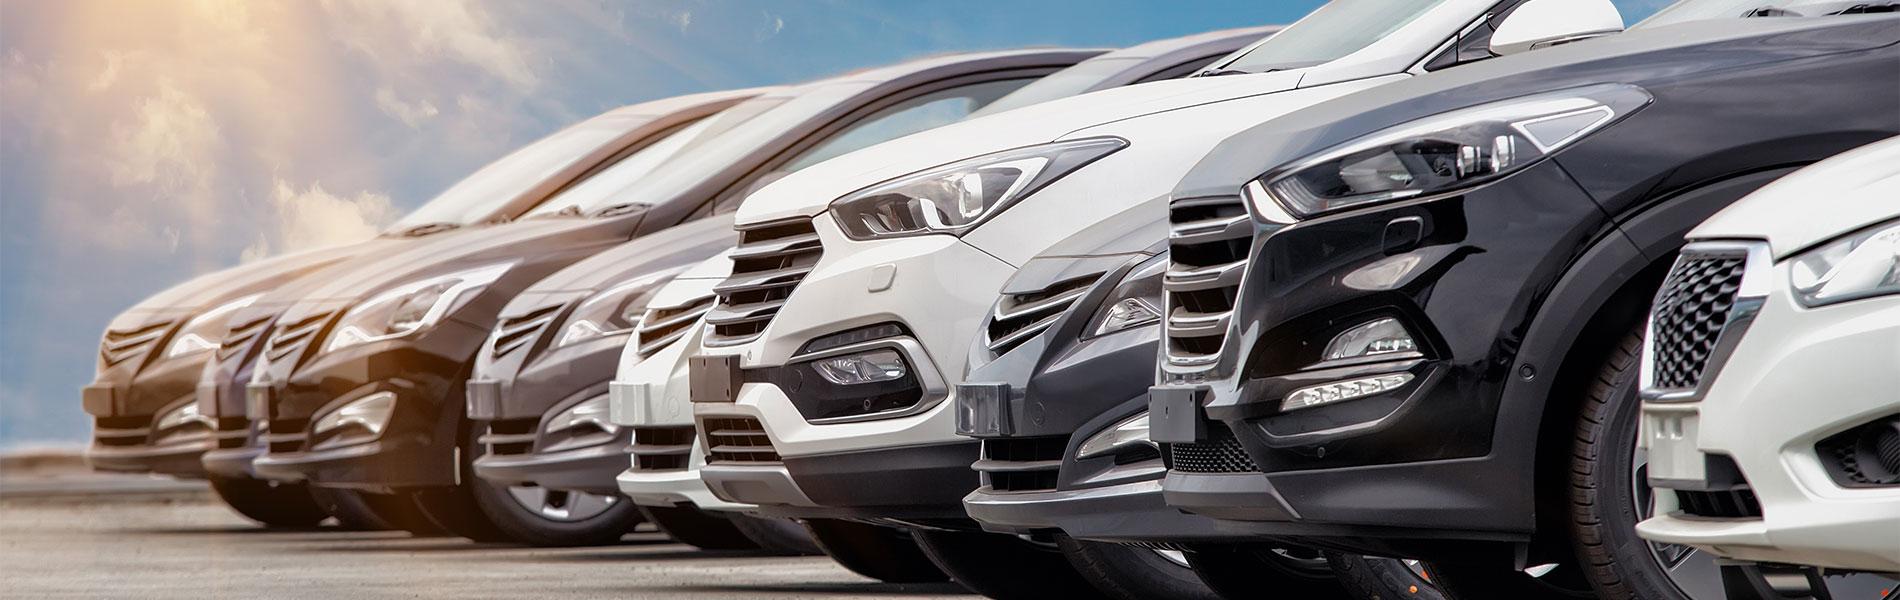 Seminole County Rental Car Accident Attorney